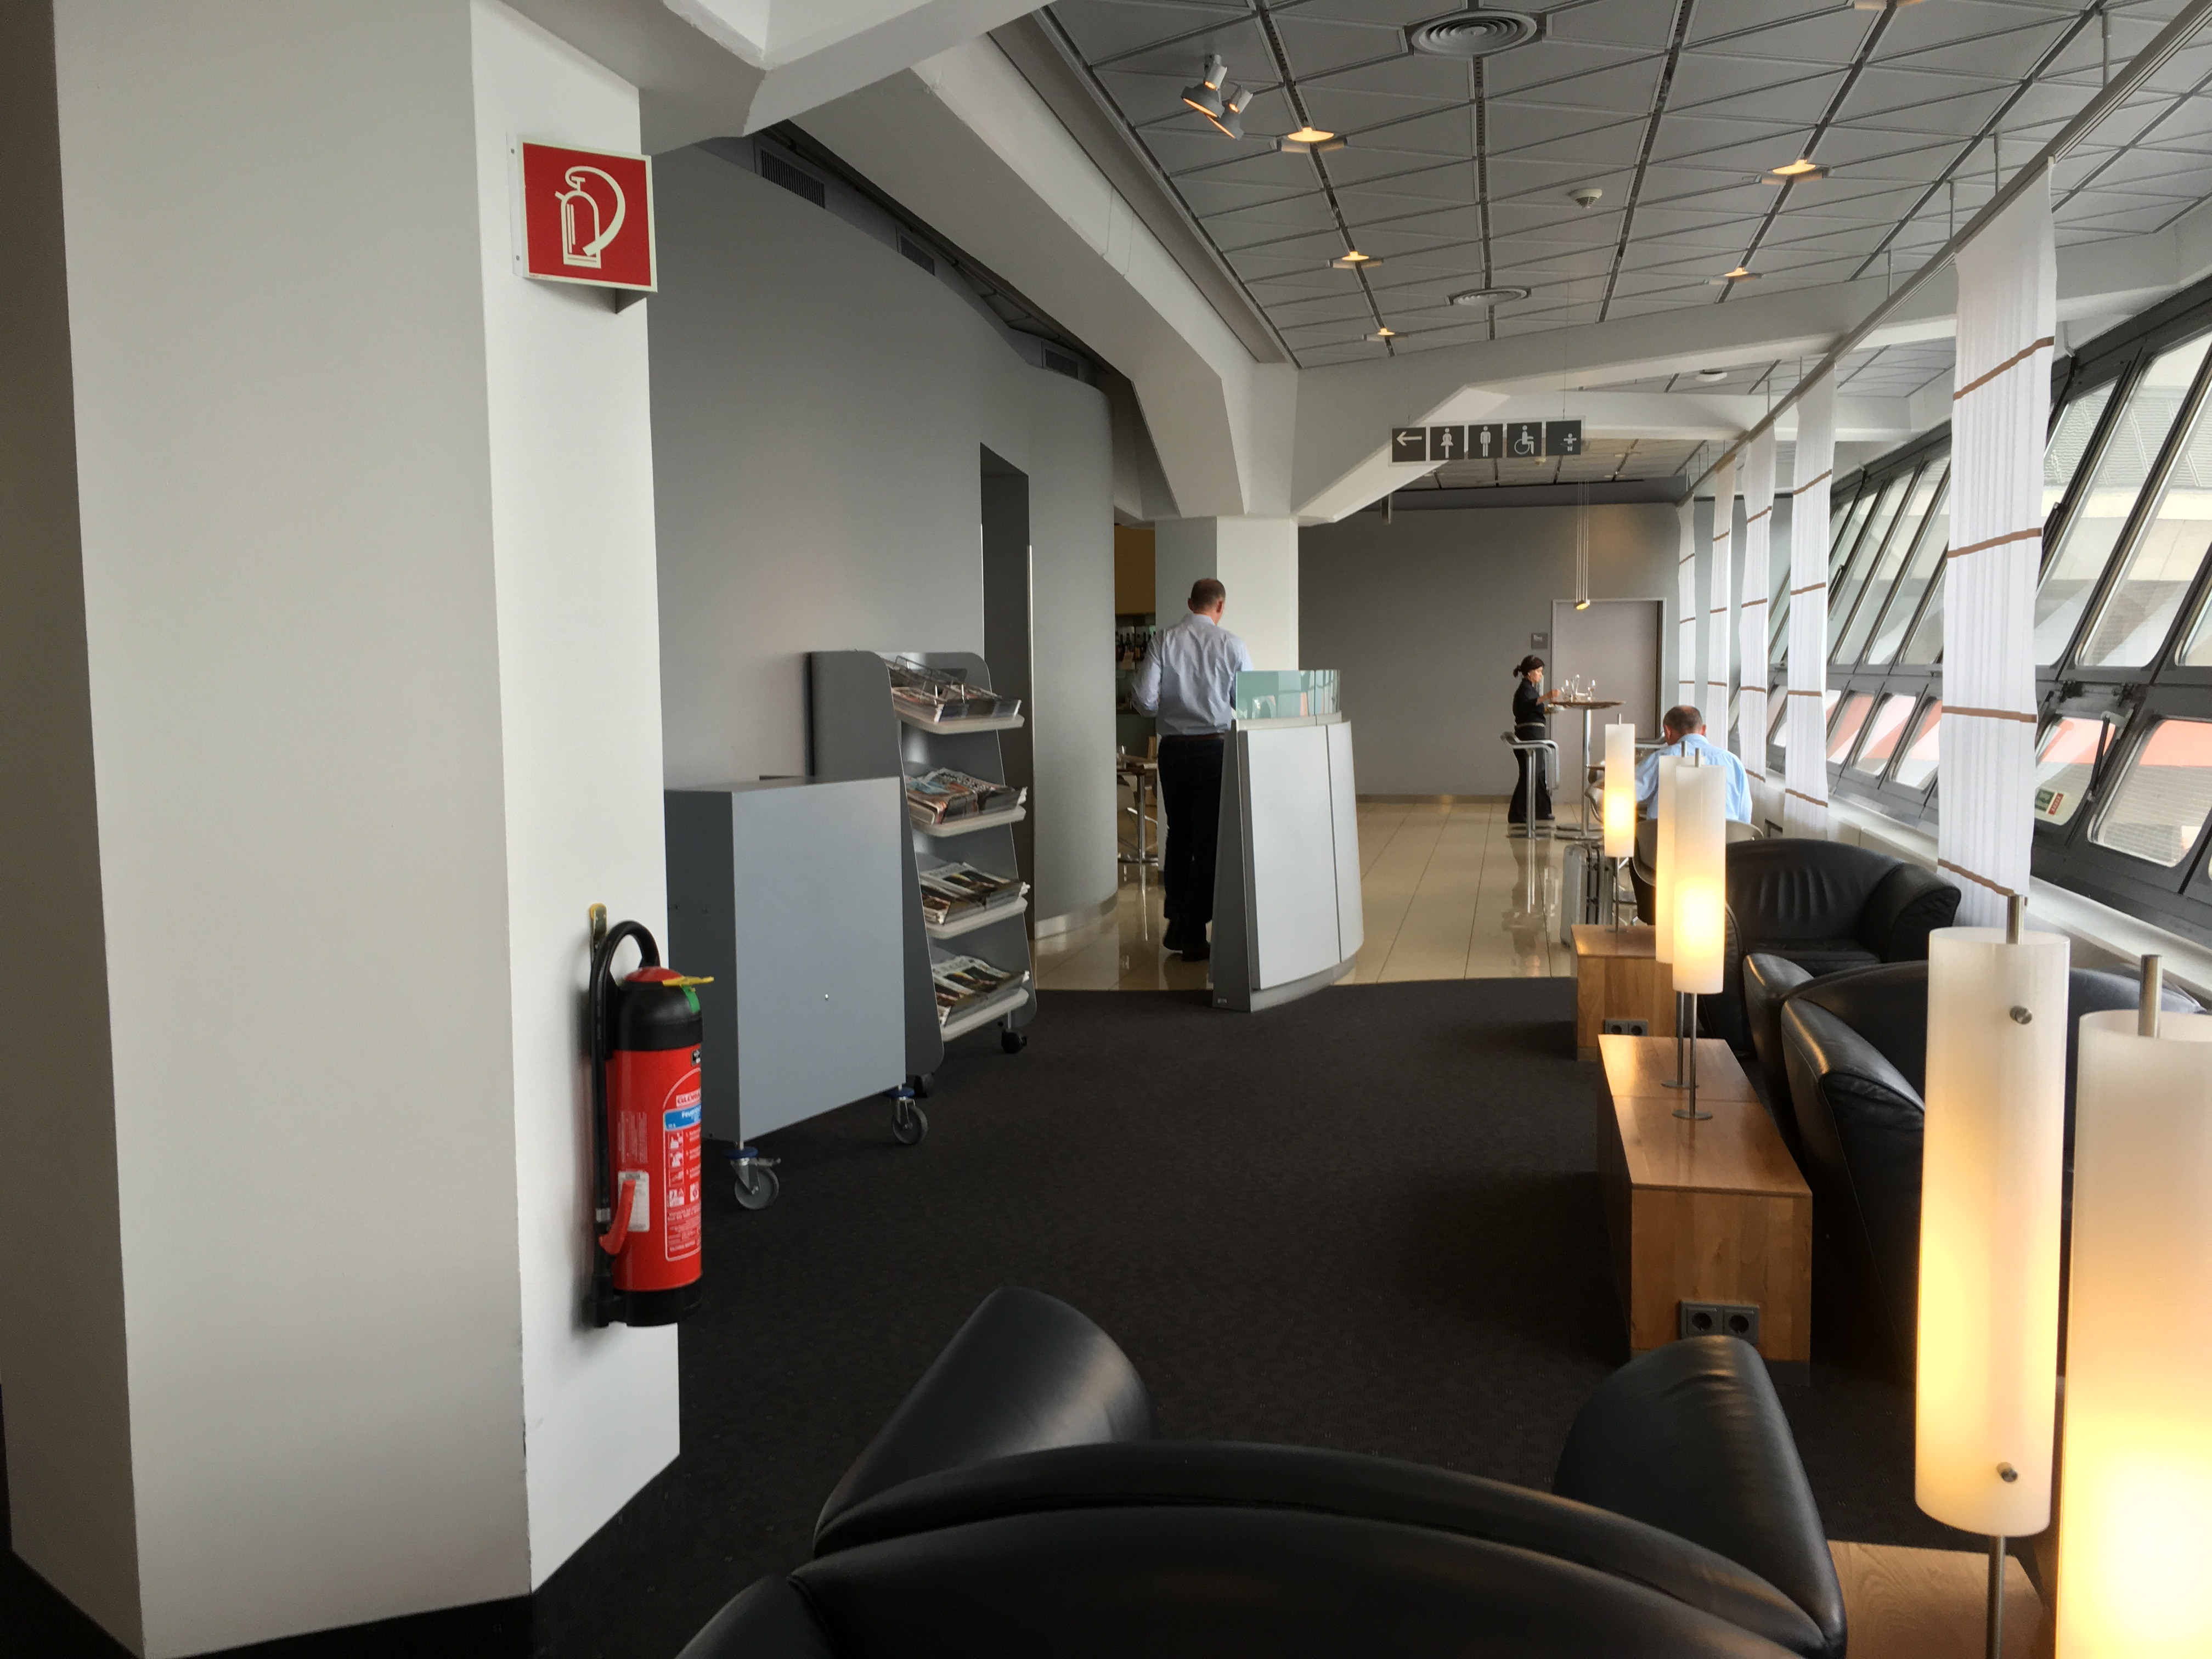 Lufthansa Senator Lounge, Berlin